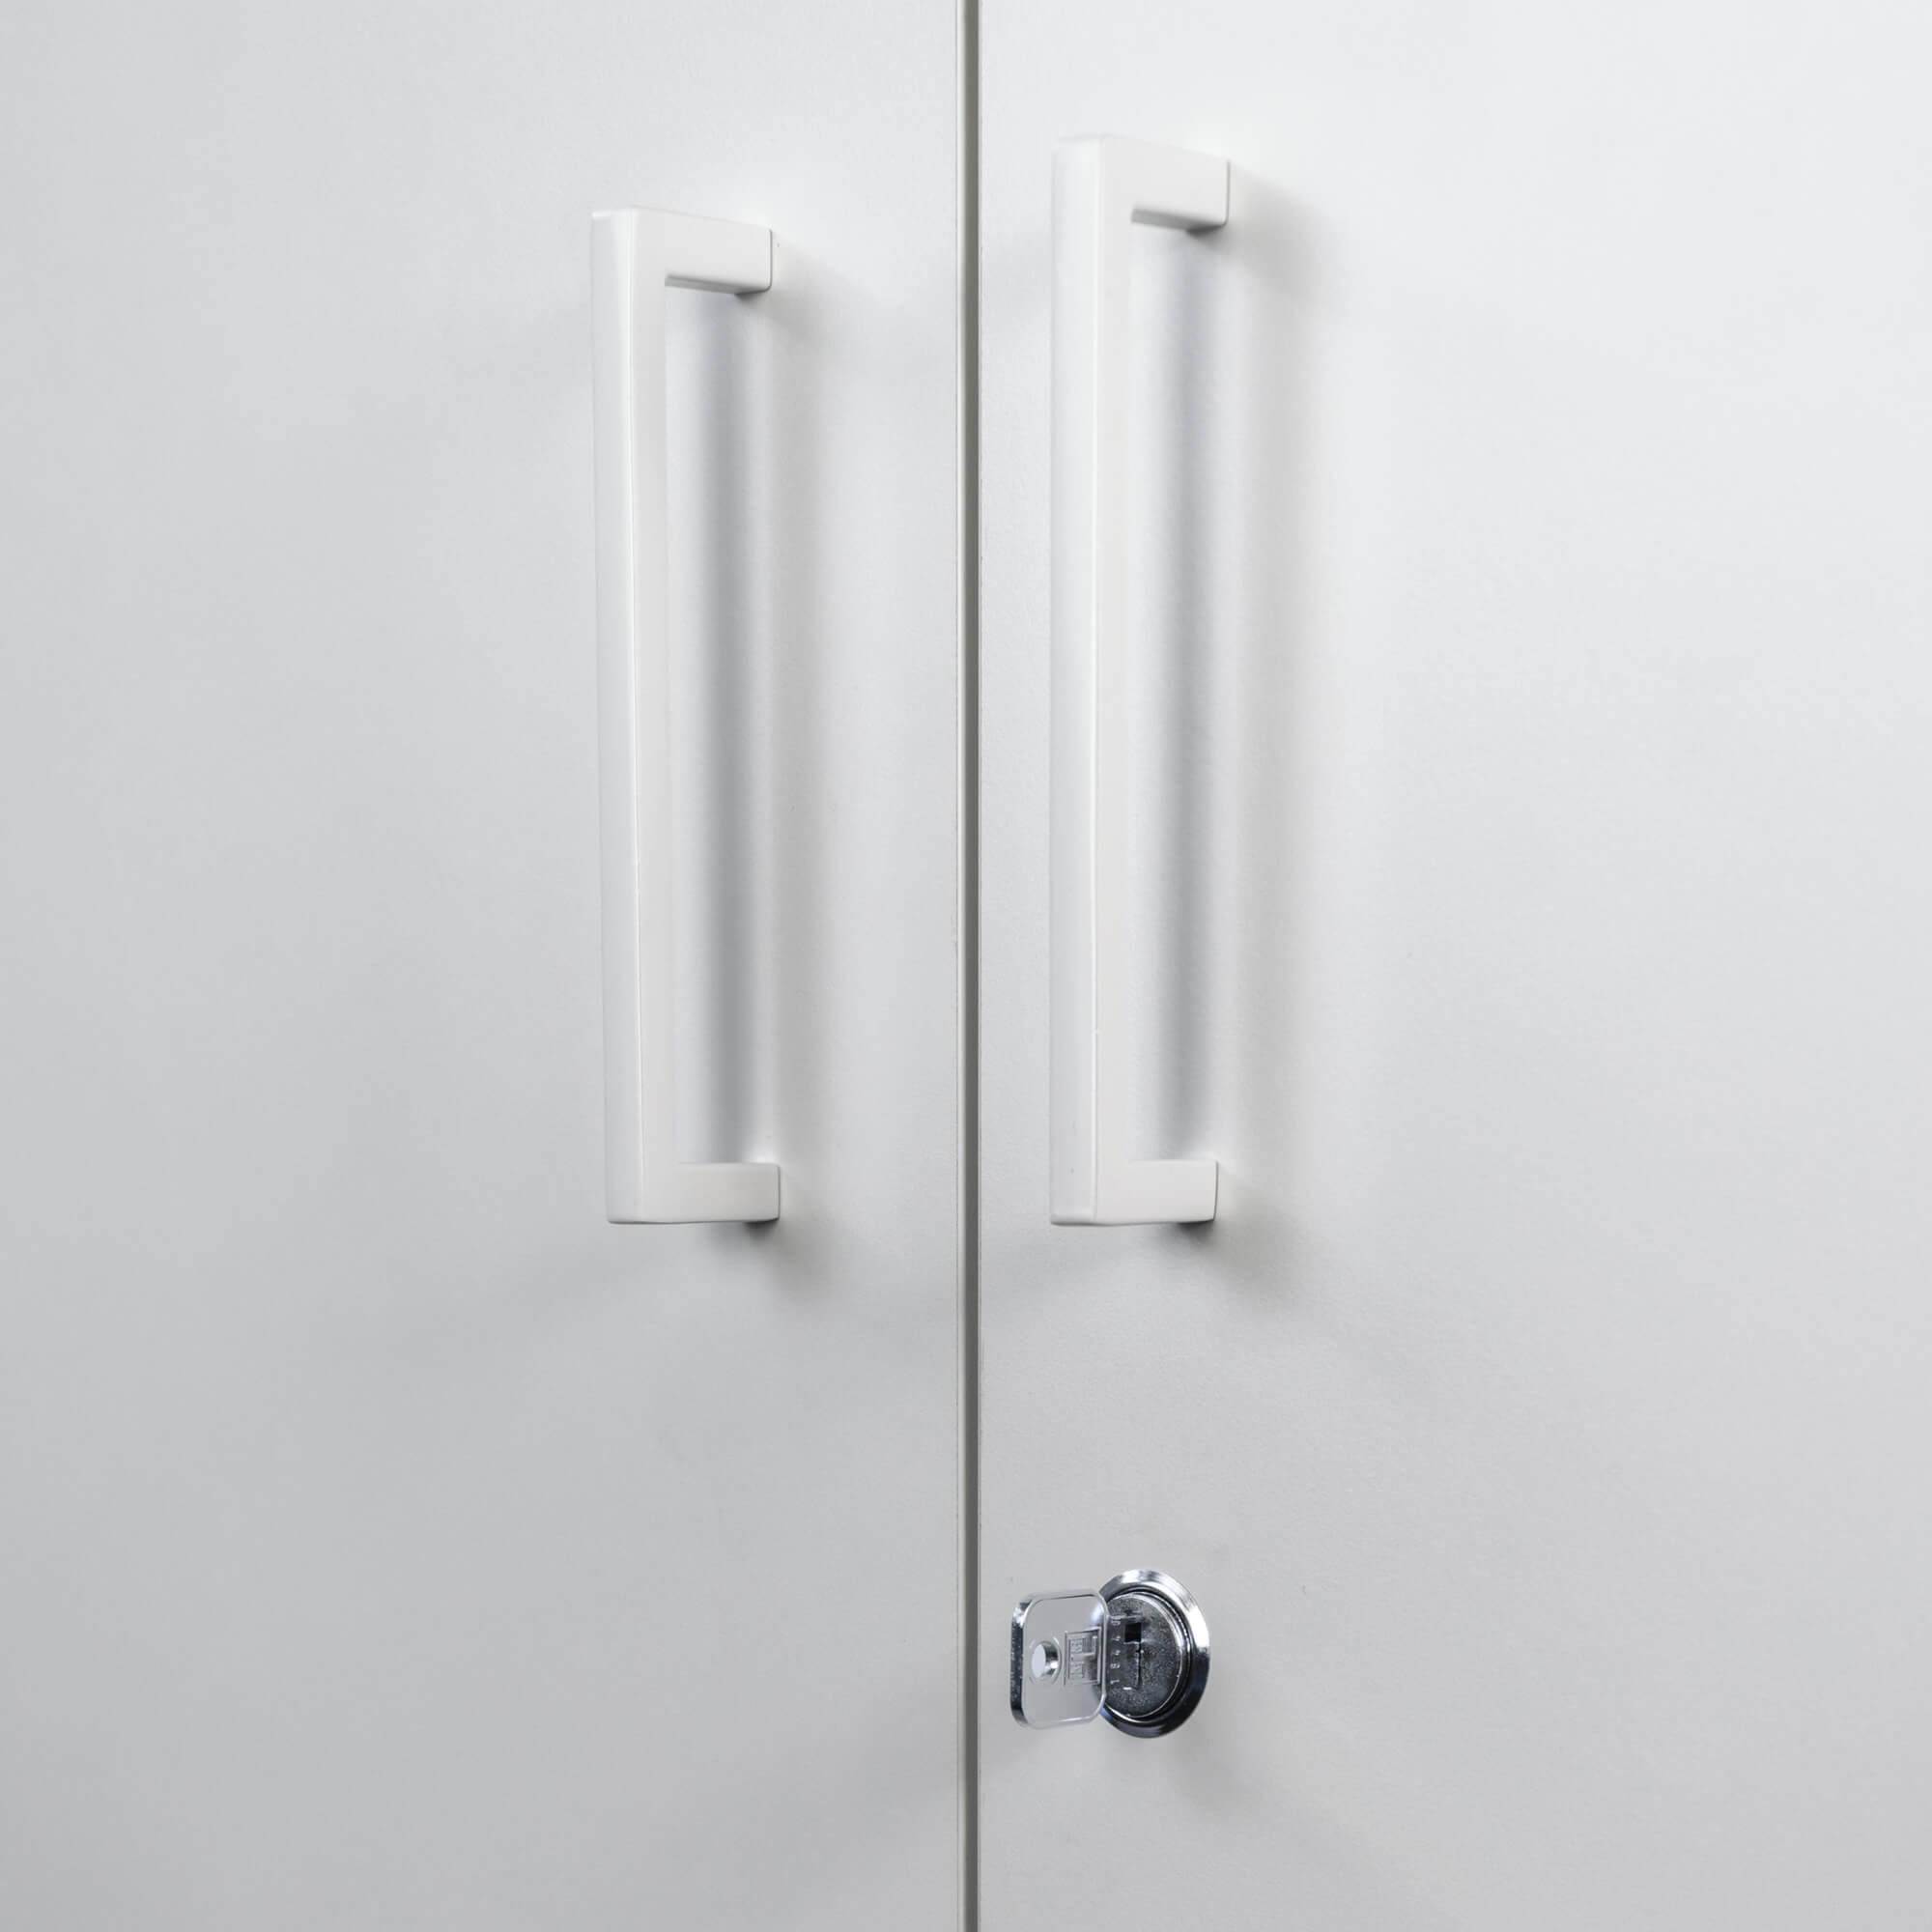 PROFI Aktenschrank abschließbar 5 OH Weiß-Anthrazit Schrank Büroschrank Flügeltürenschrank